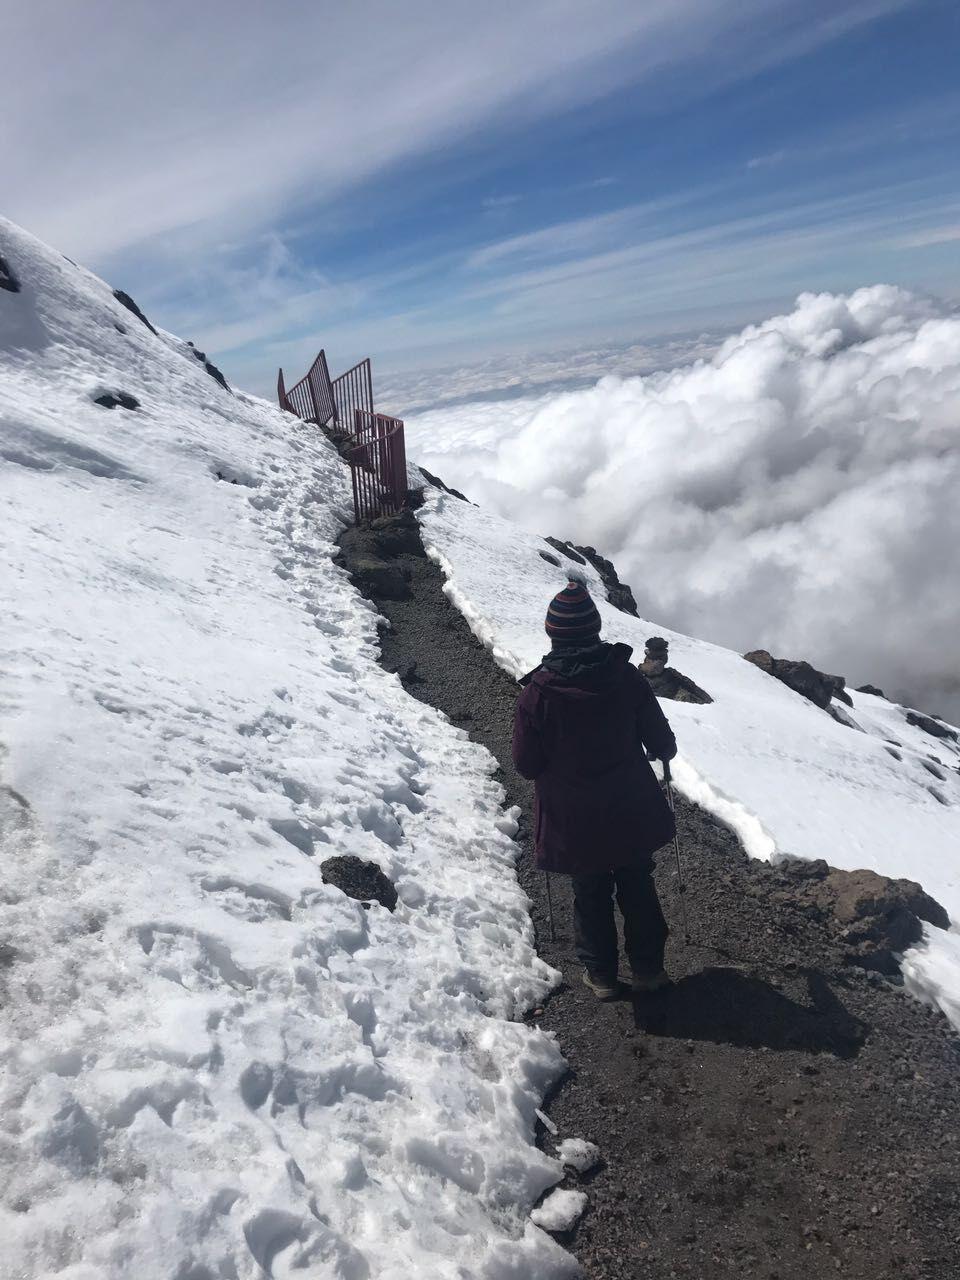 Take in the barren beauty of Kilimanjaro's <br> eastern icefields.